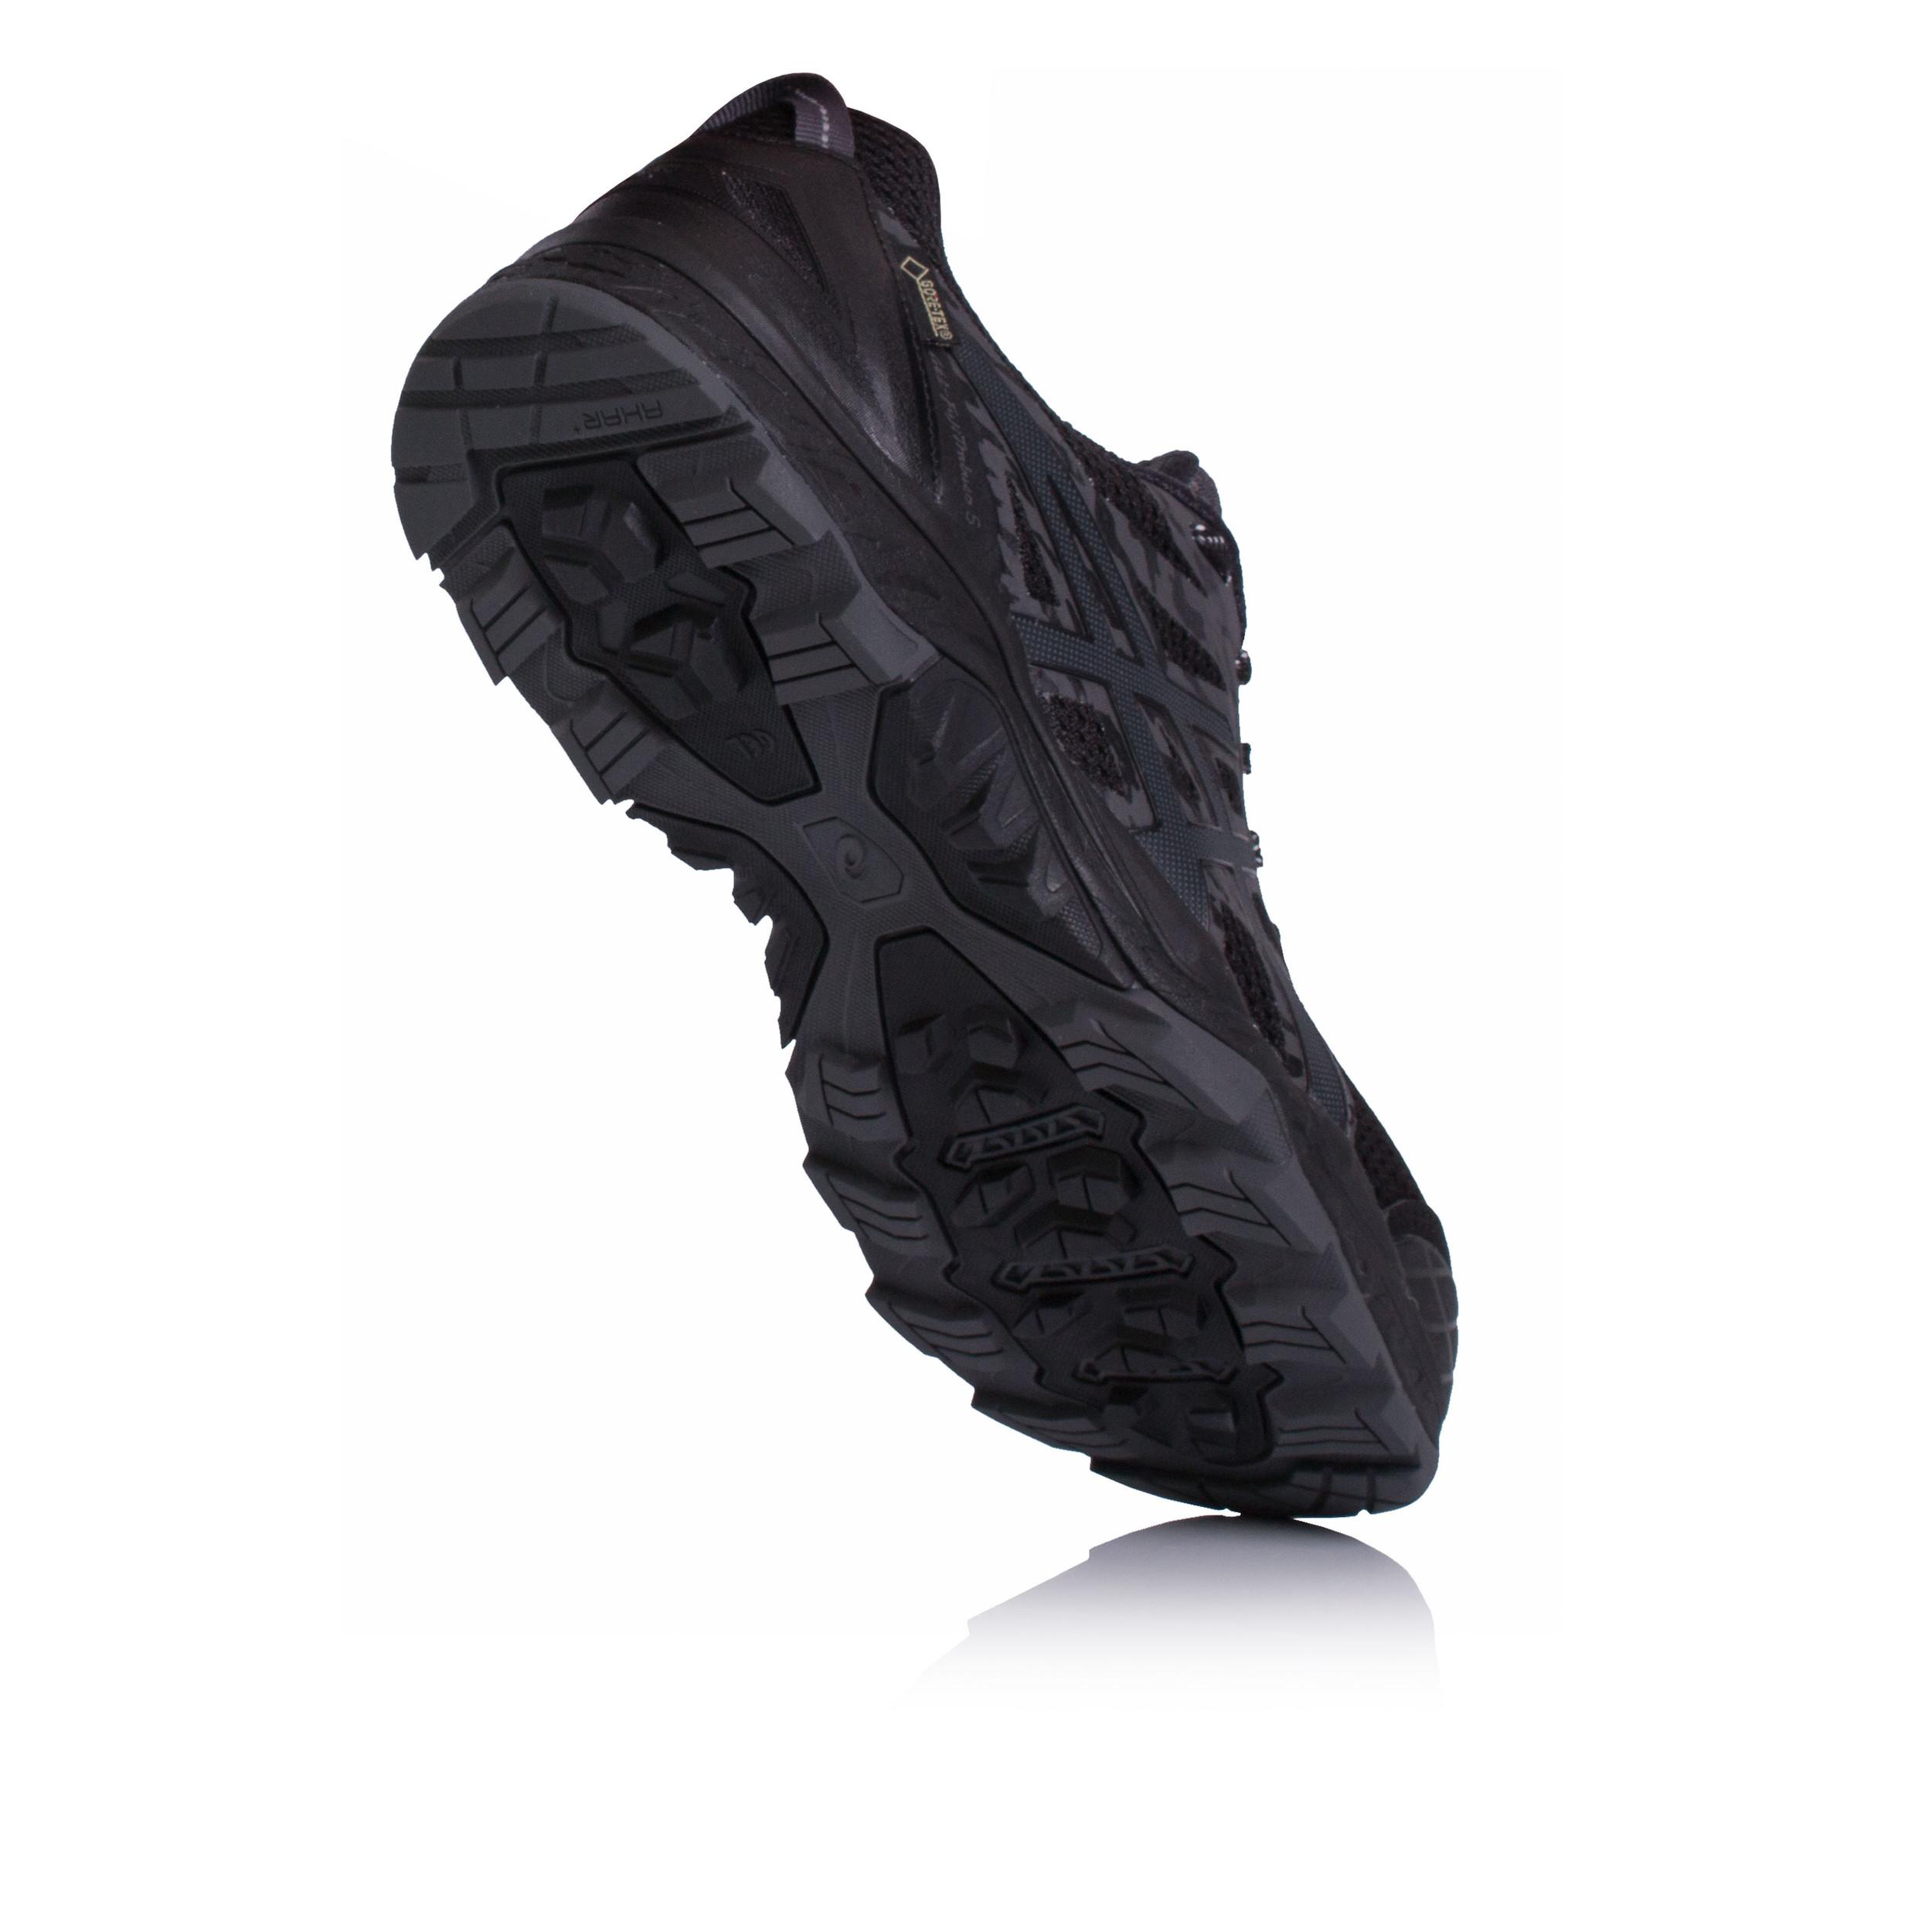 Tex Shoes Running Black Fujitrabuco Womens Gel Asics Gore 5 Support YBwz17